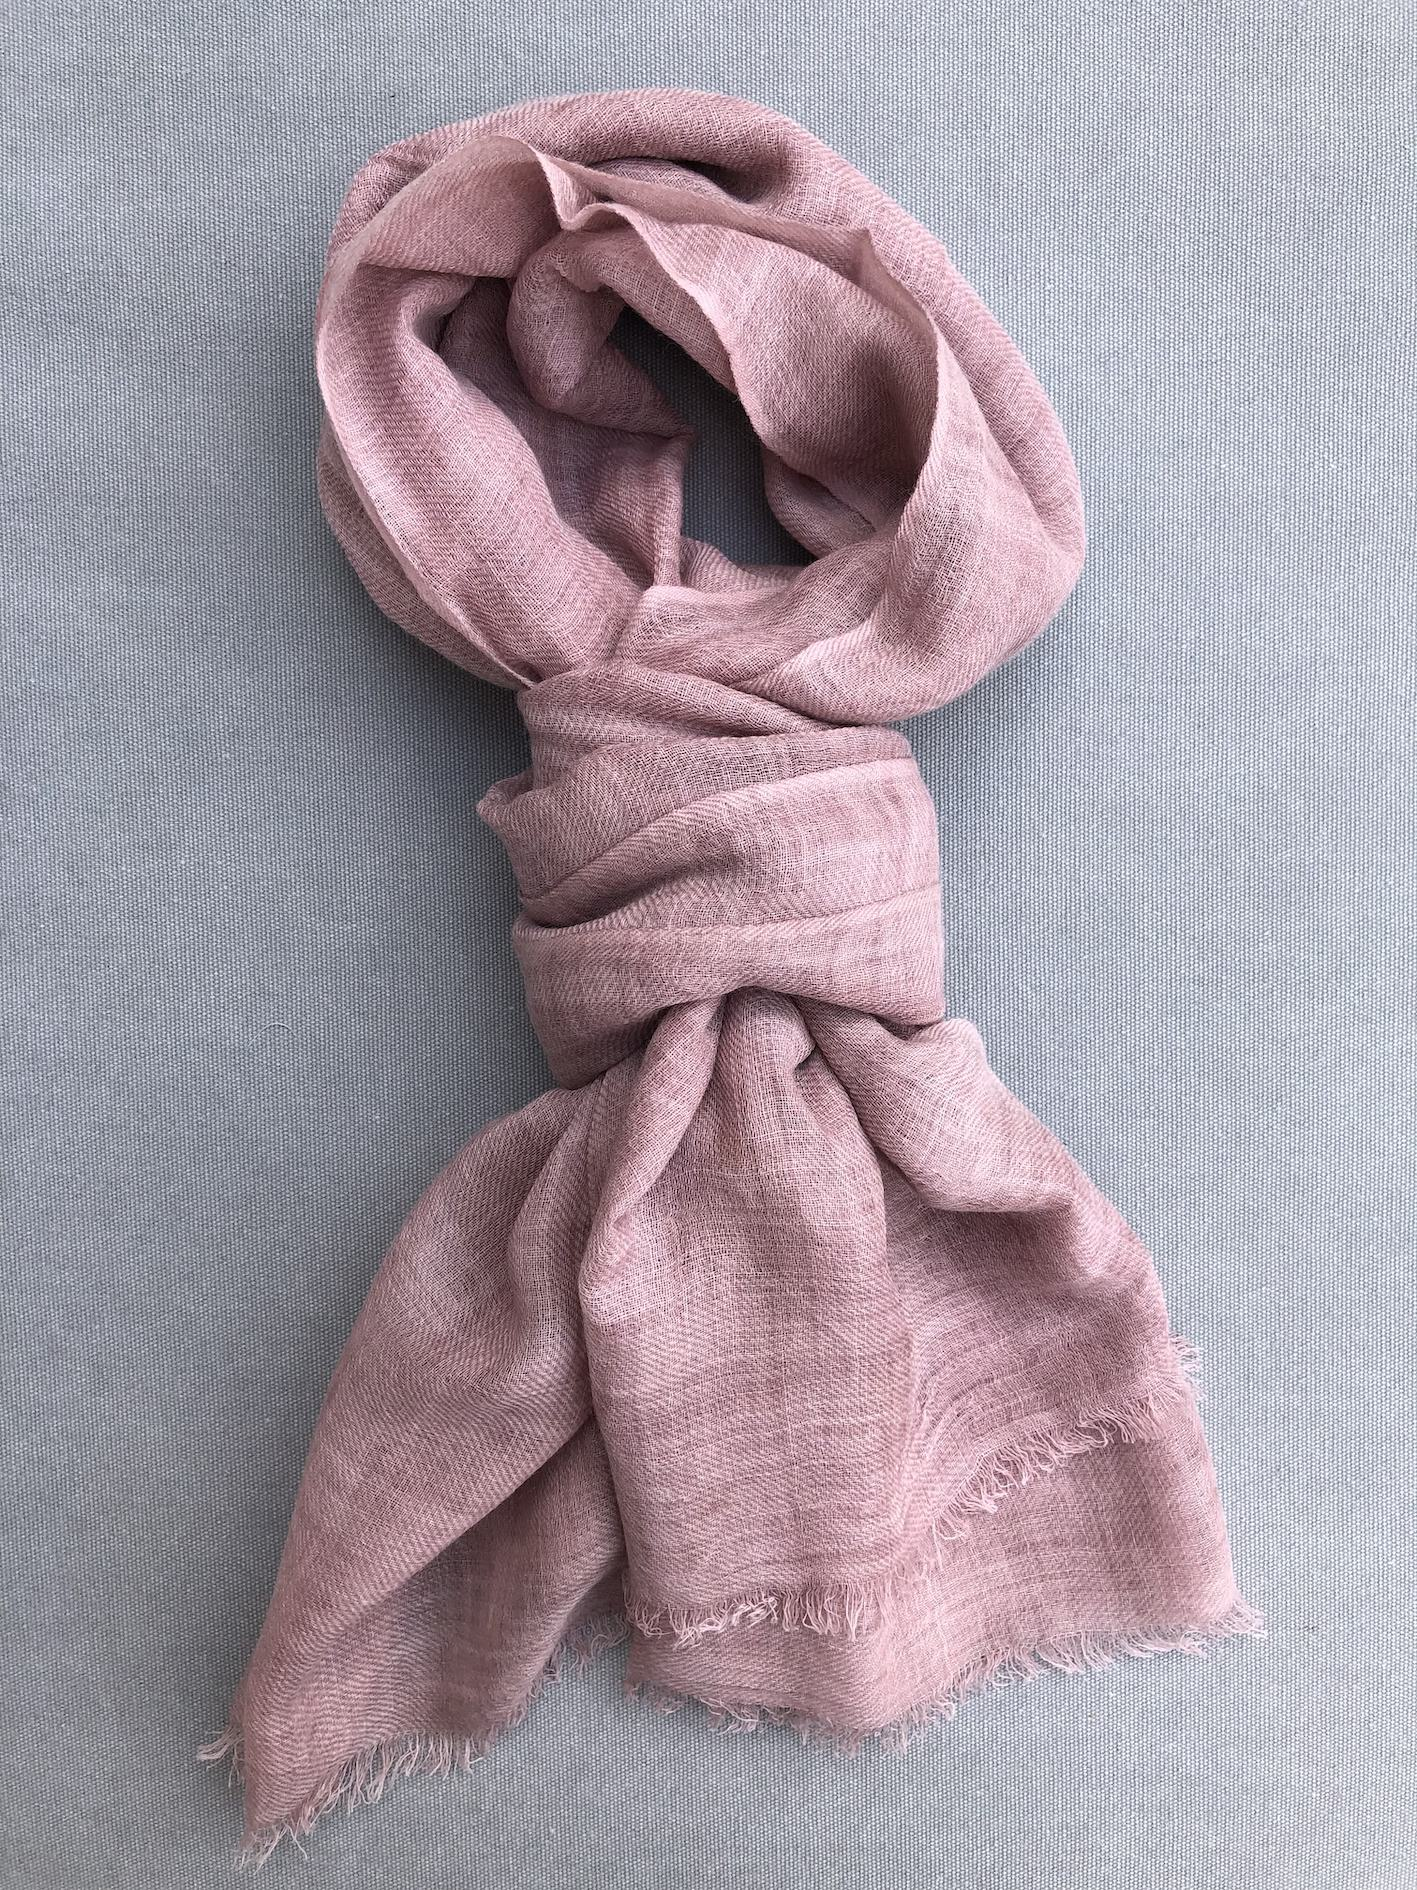 gammel-rosa-toerklaede-i-uld